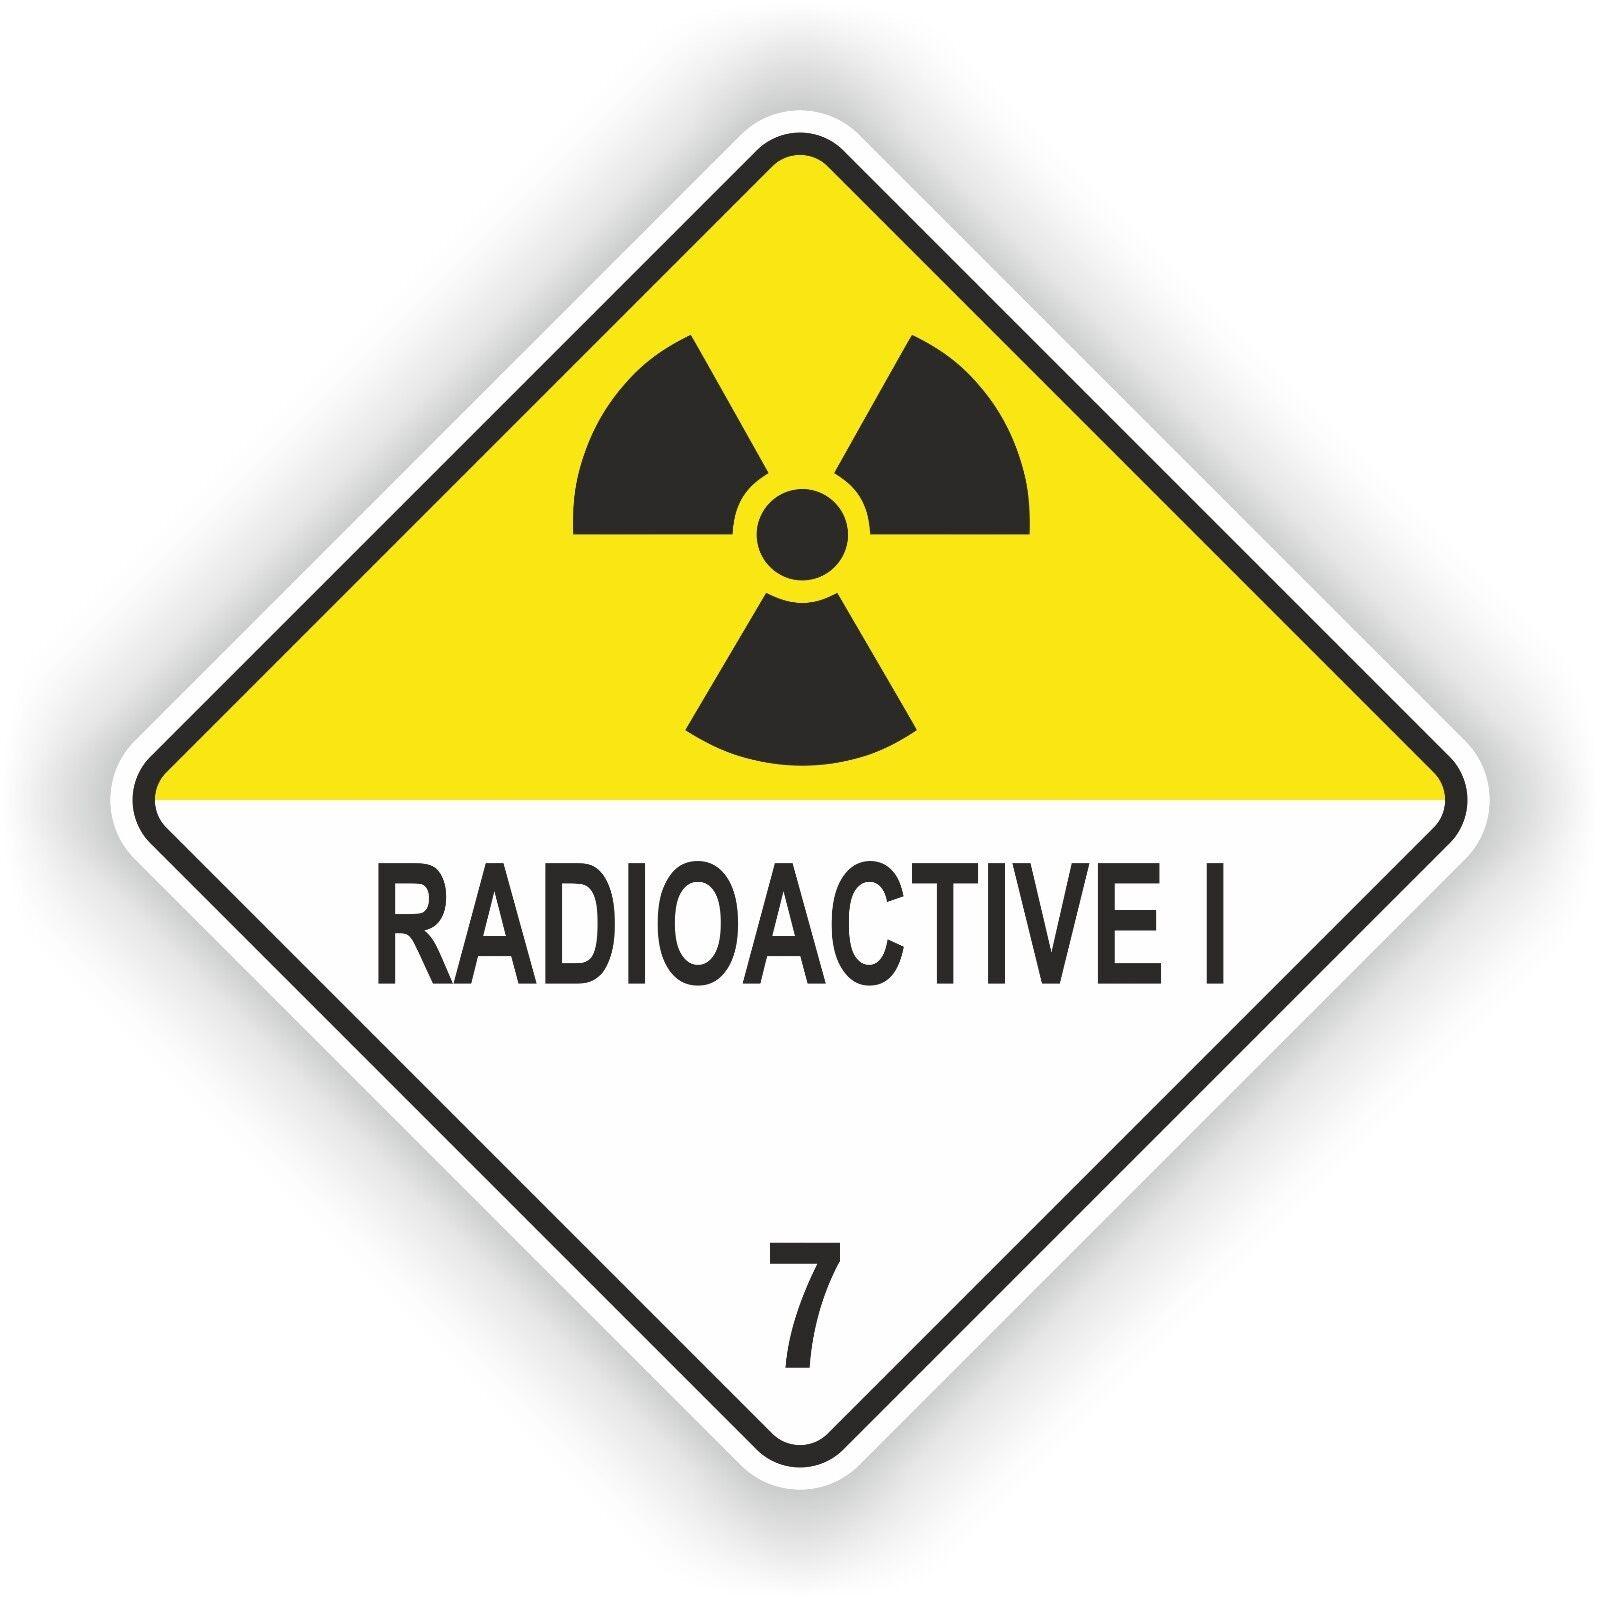 1x Radioactive I 01 Warning Sticker Atomic Nuclear Radiation Symbol